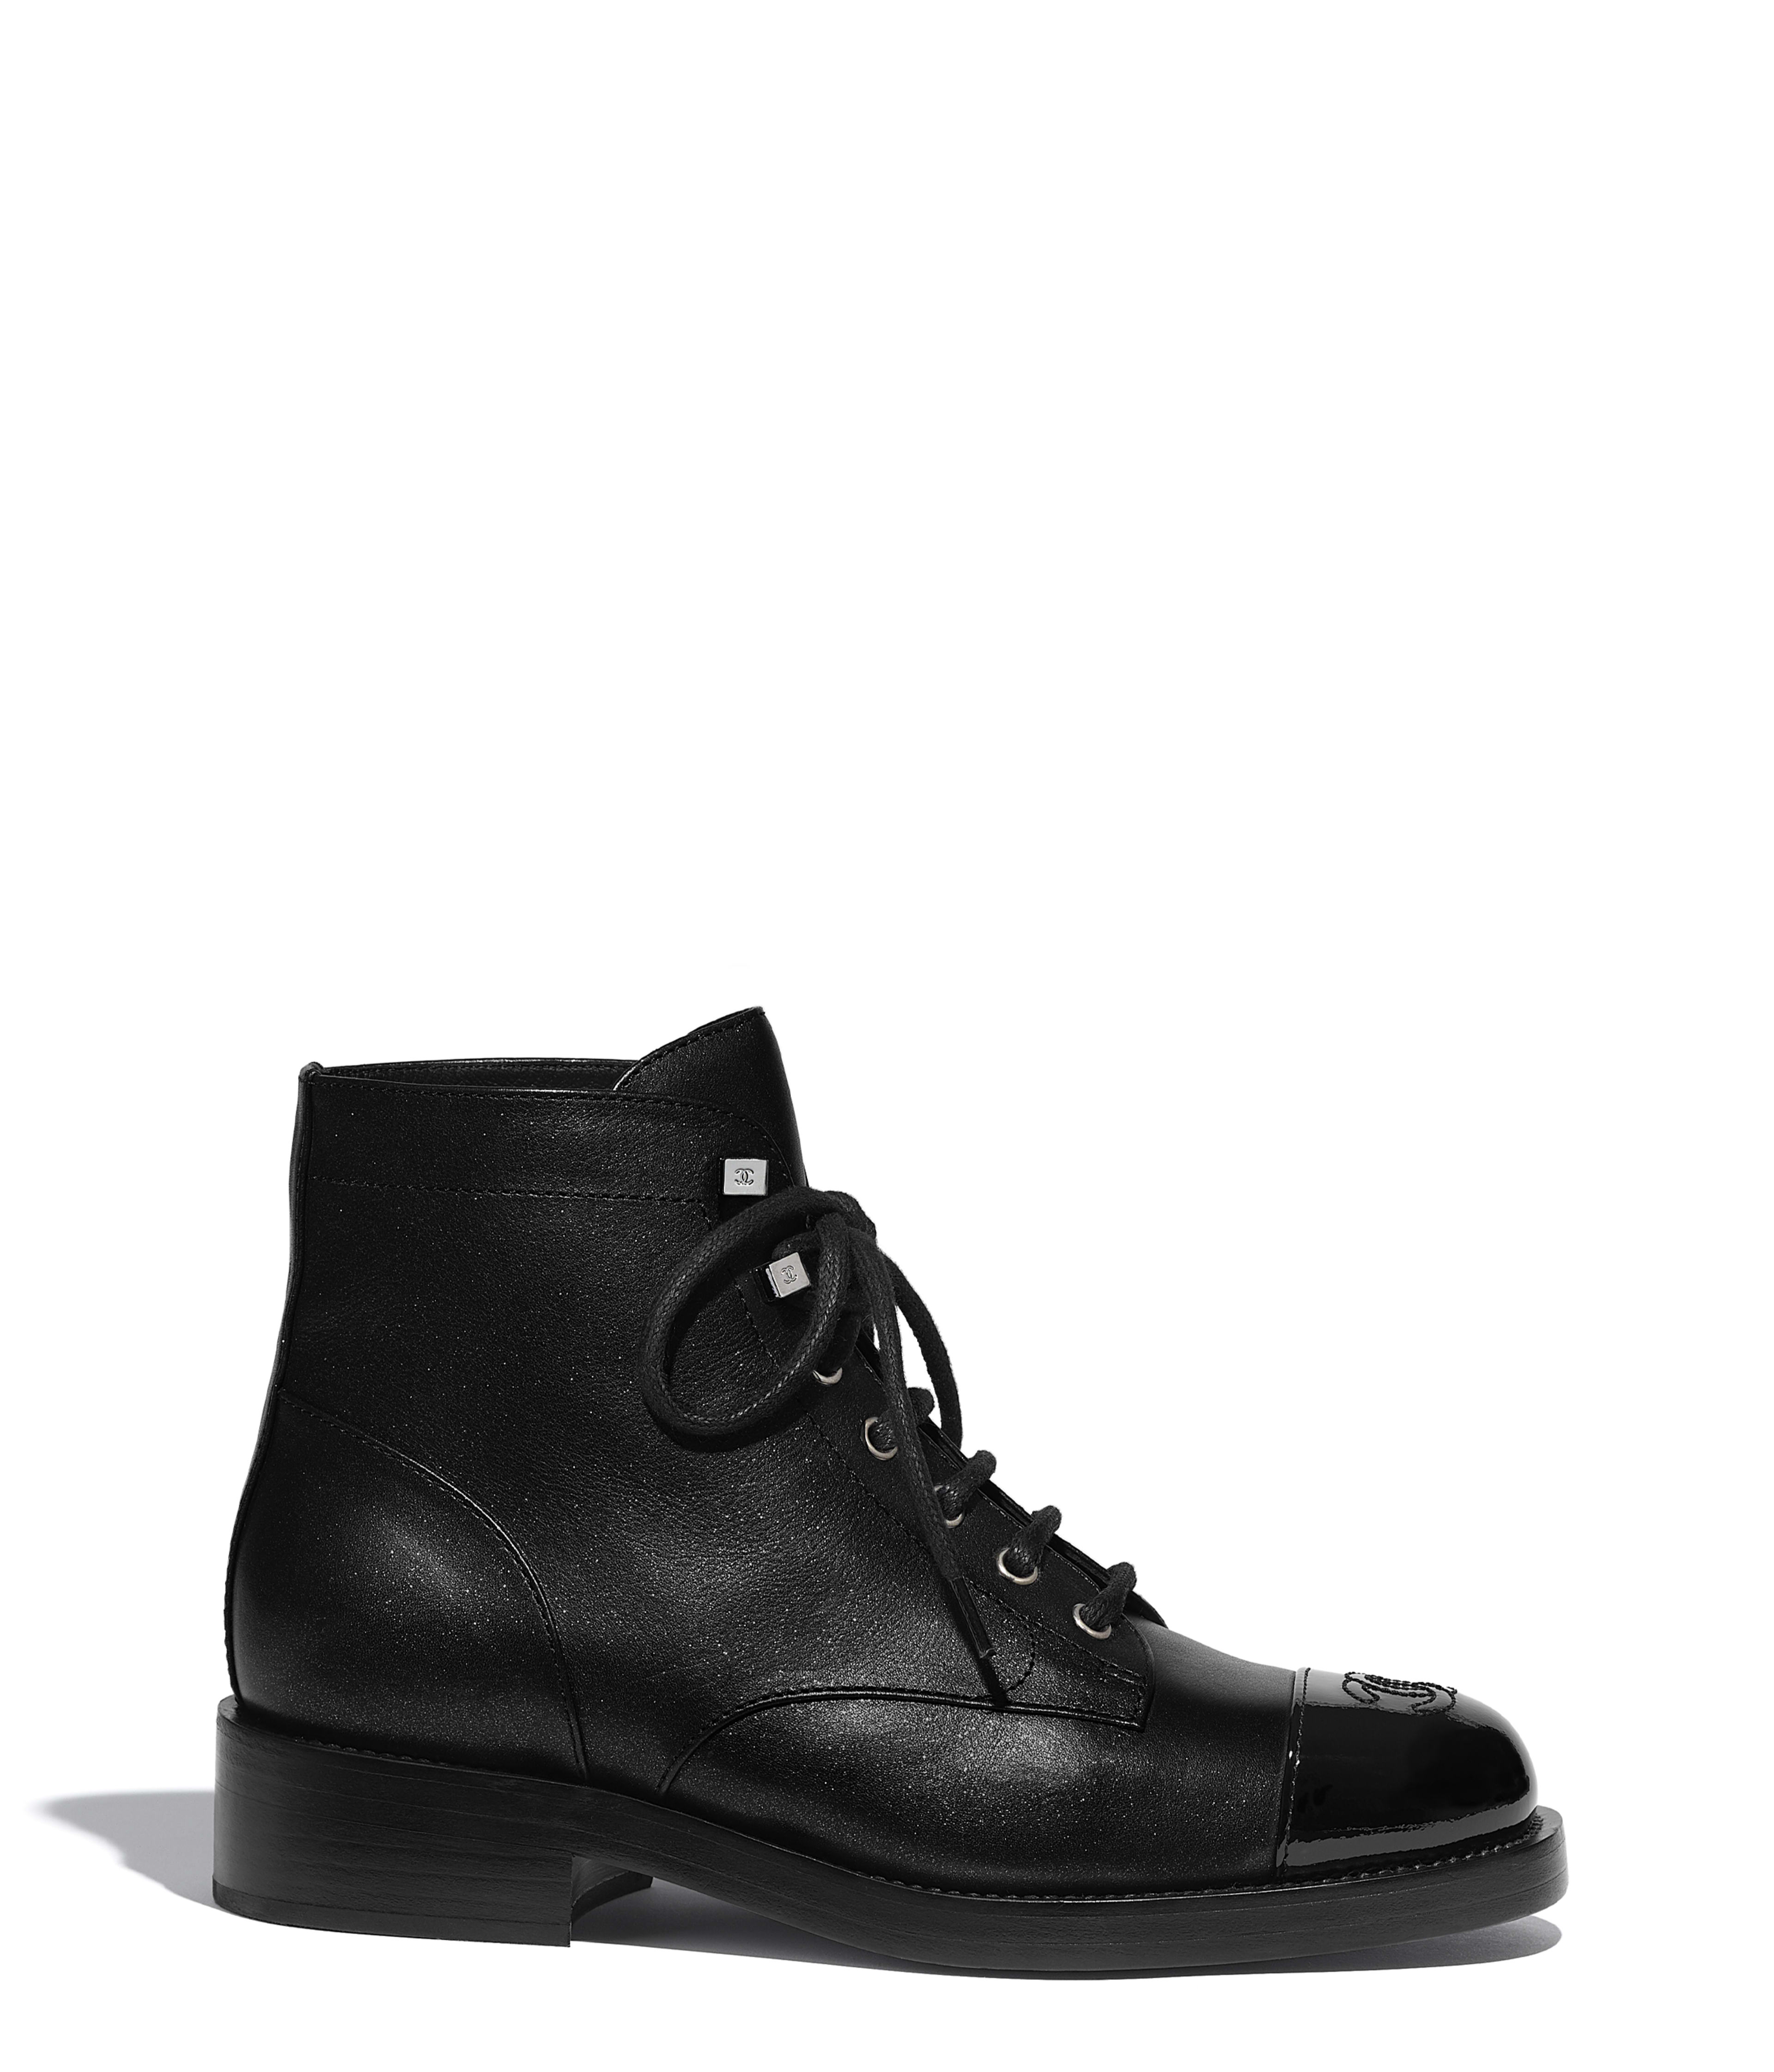 Lace-Ups - Shoes   CHANEL